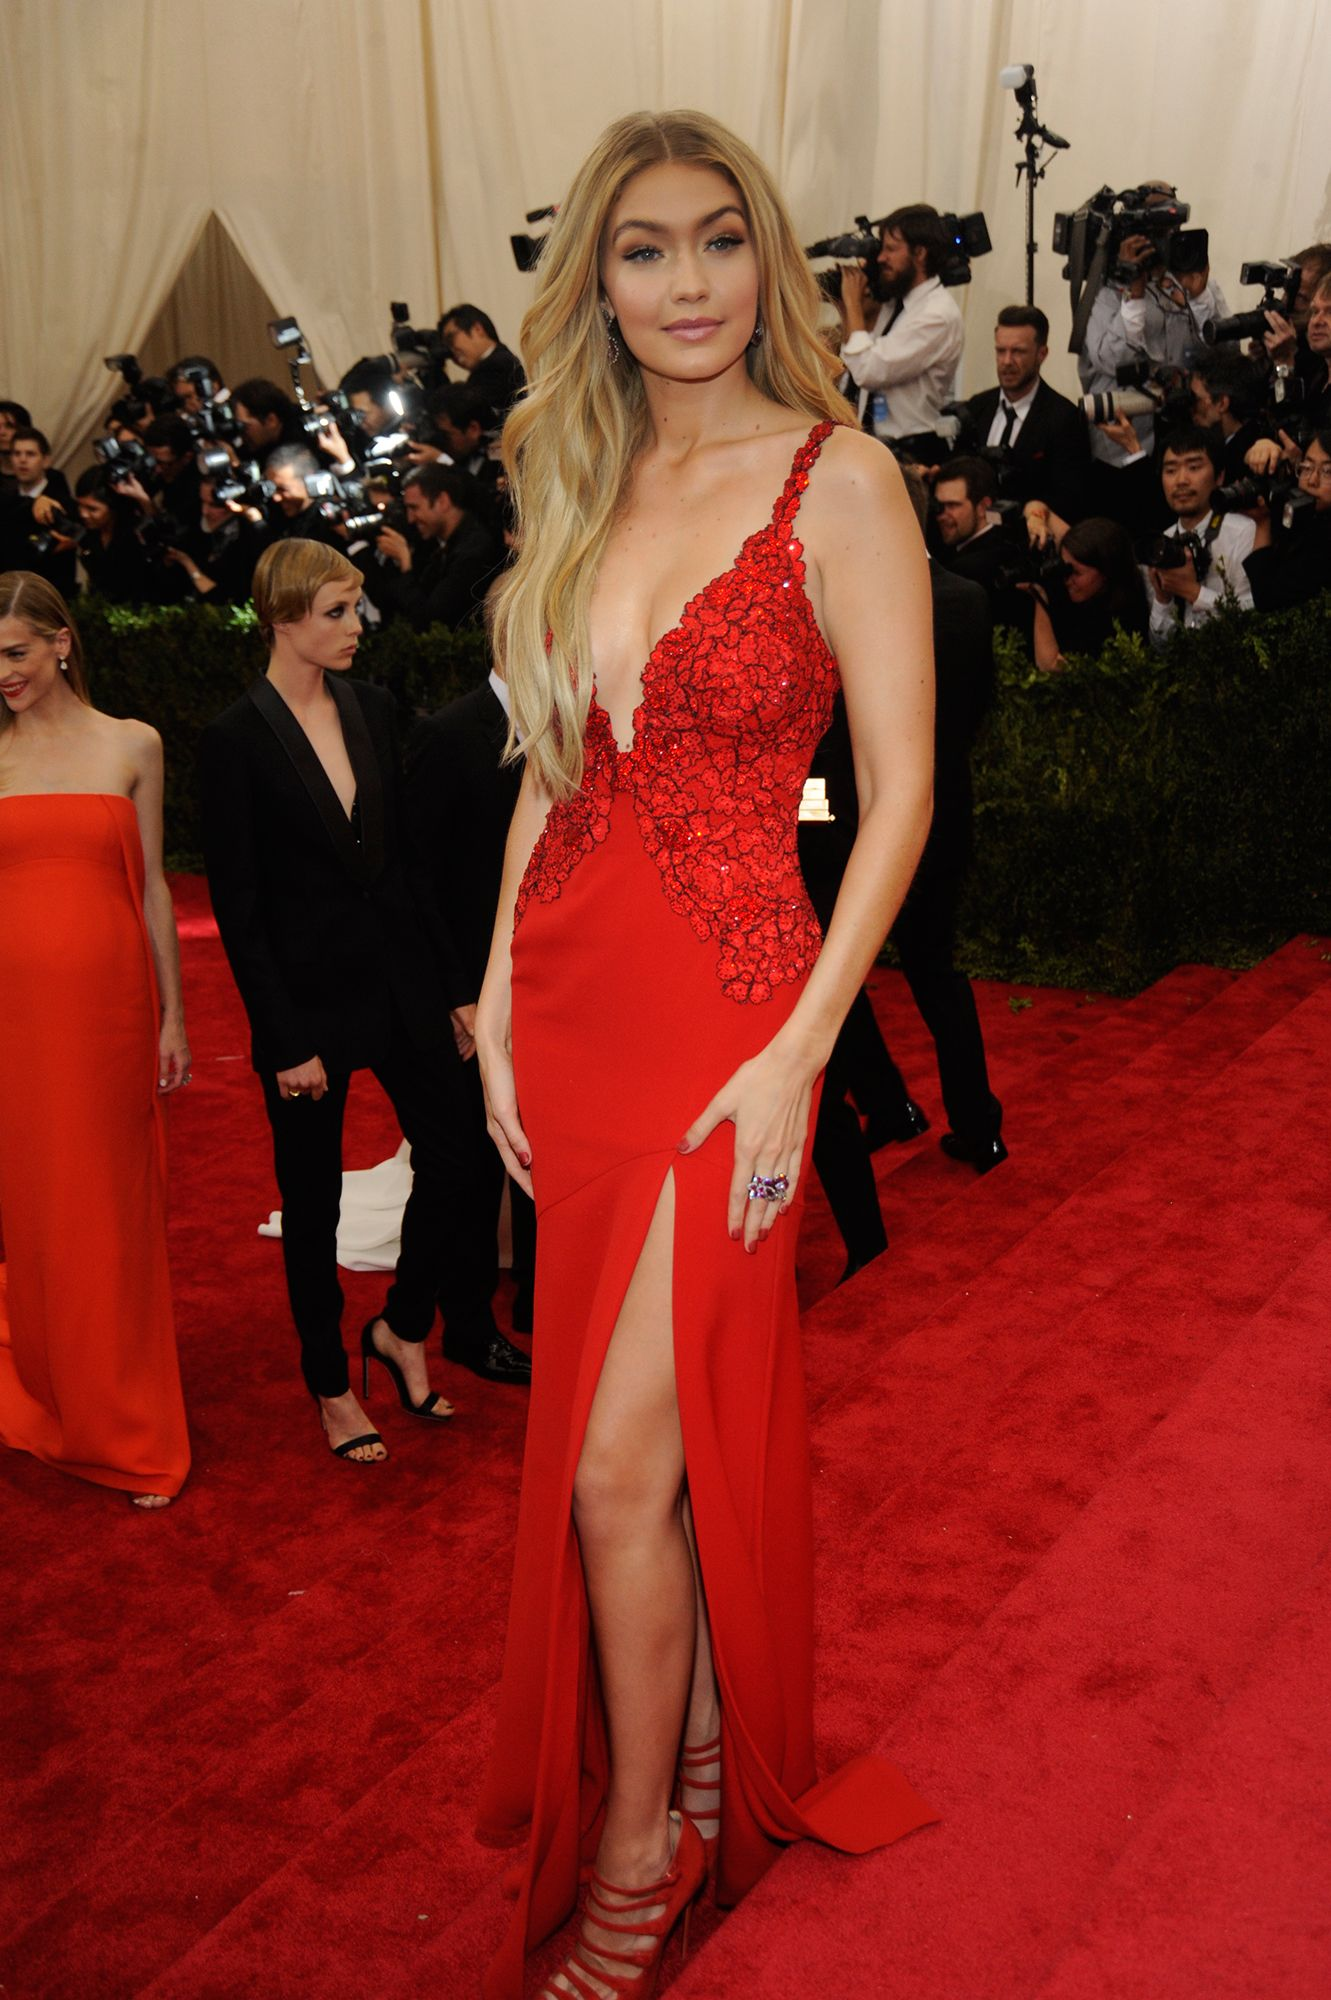 Gigi Hadid - The Best Celebrity Looks From The 2015 Met Gala | W Magazine